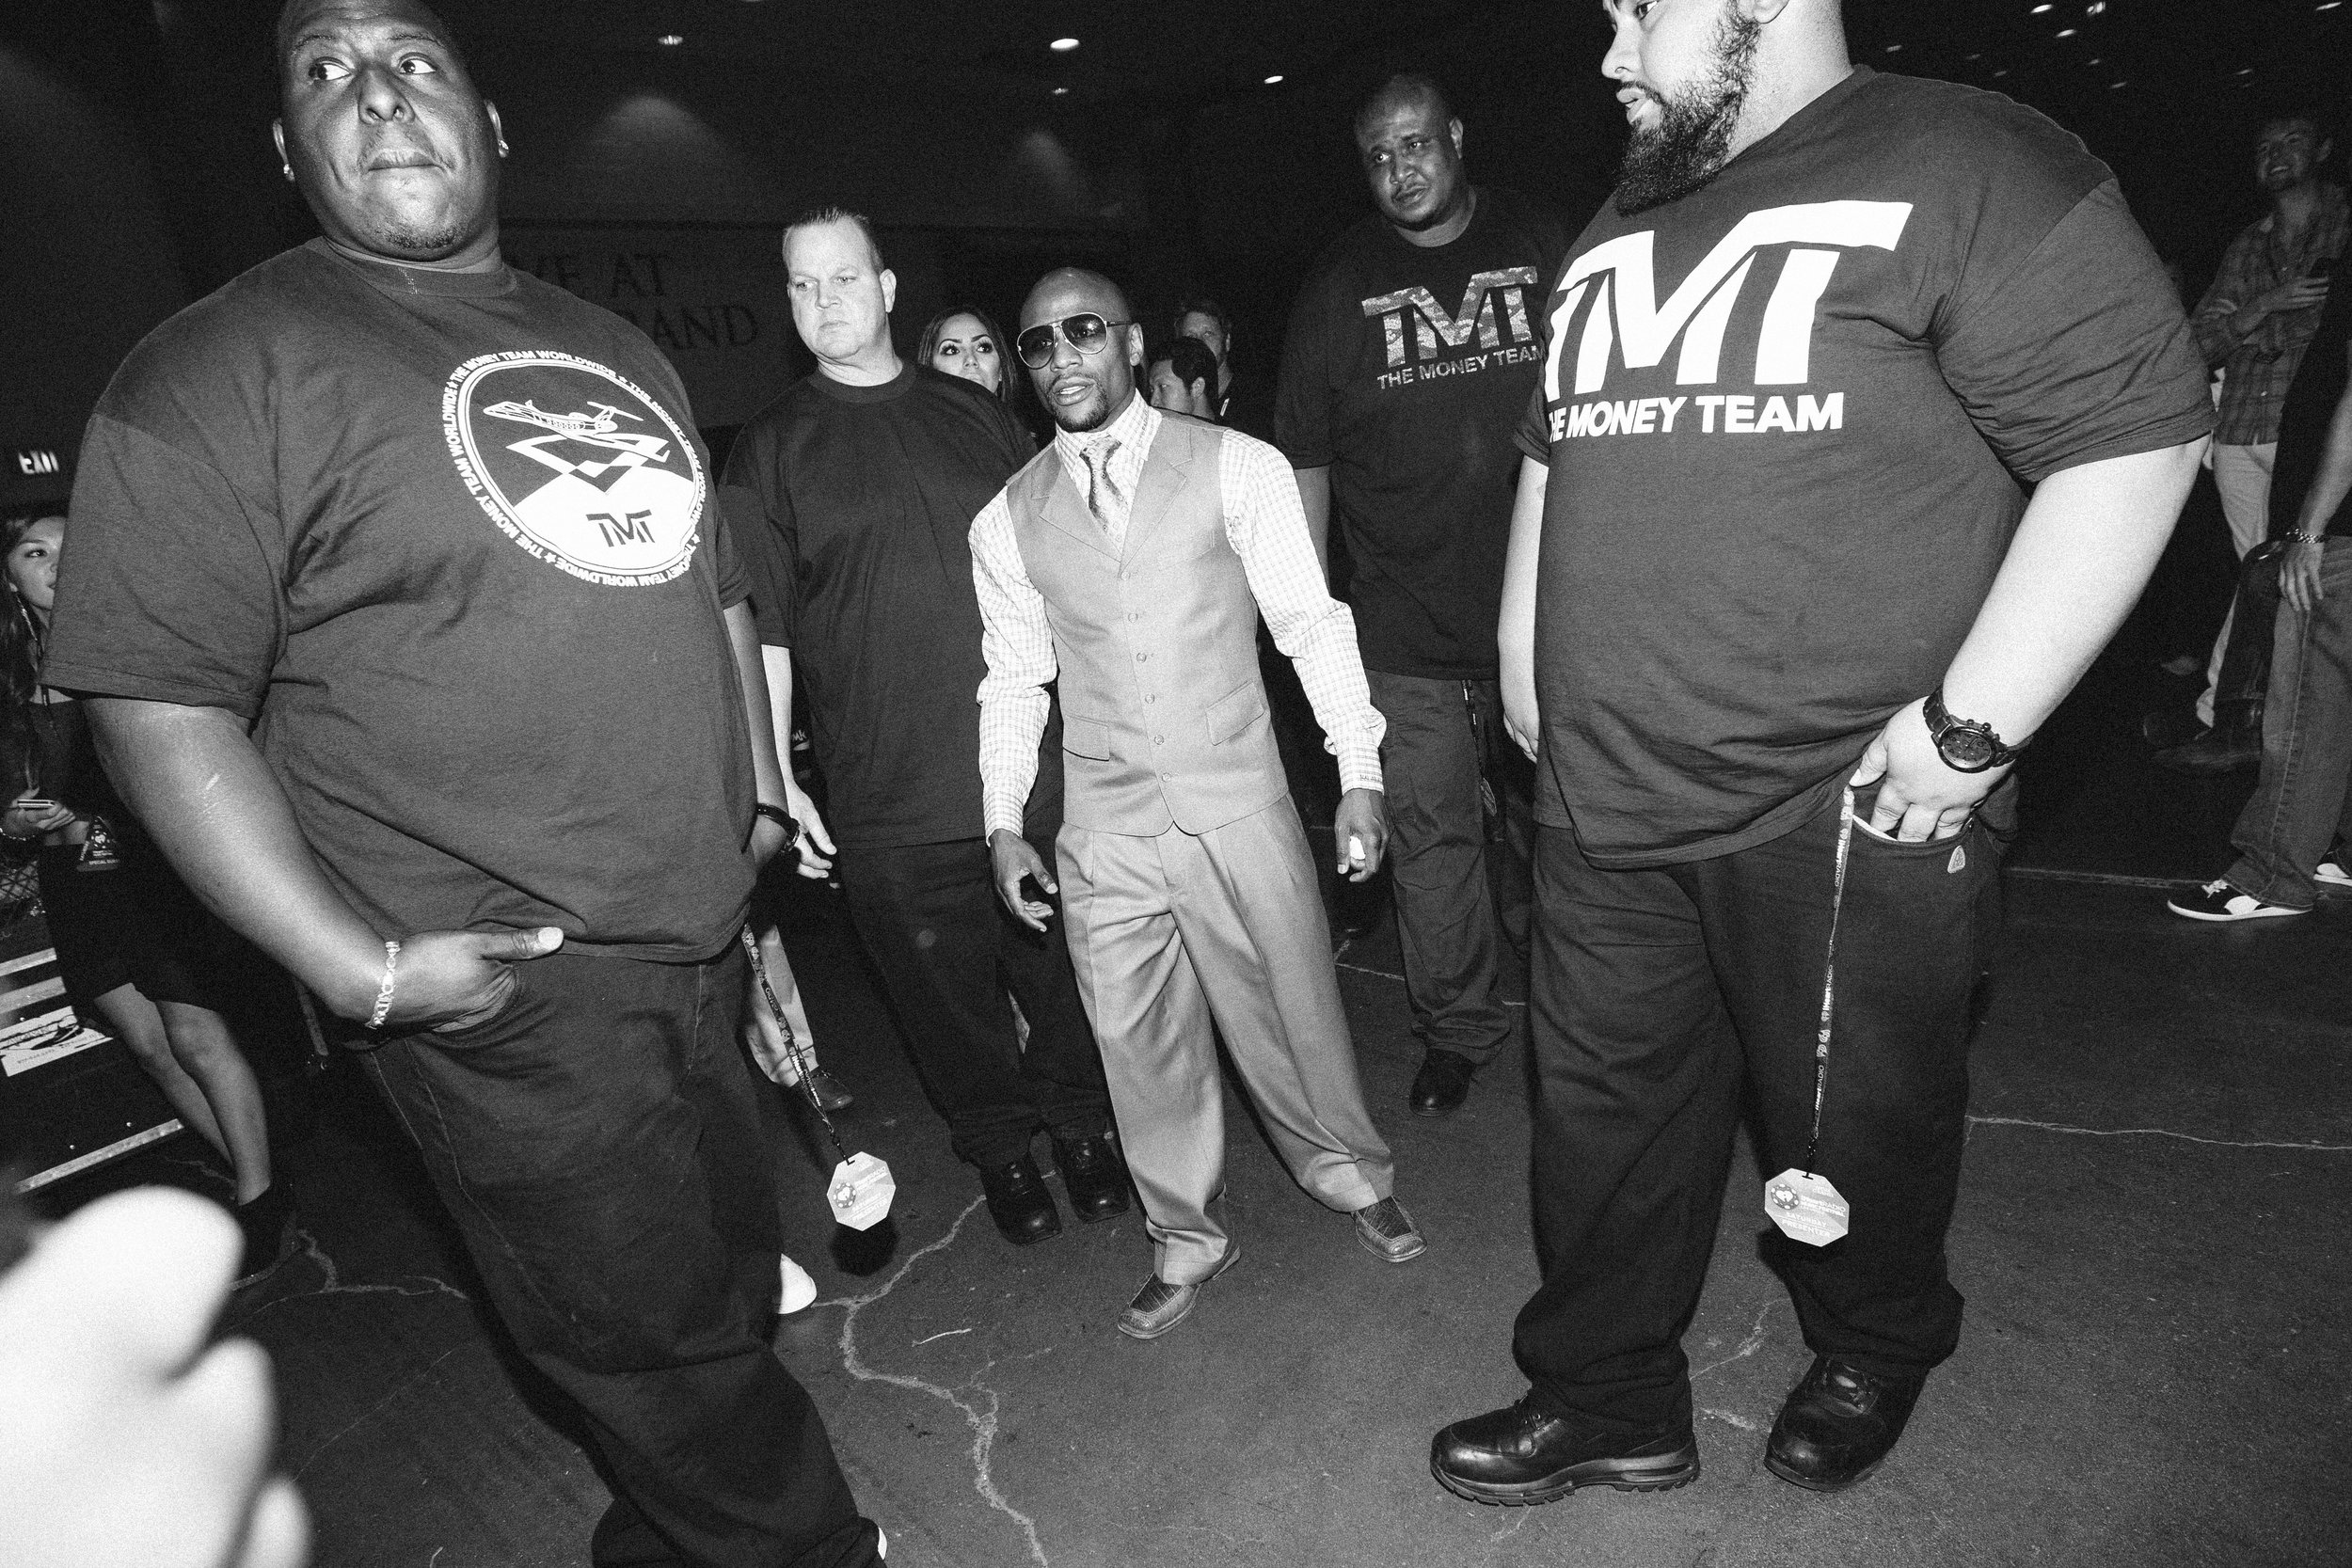 Floyd Mayweather, LasVegas, MGM Grand